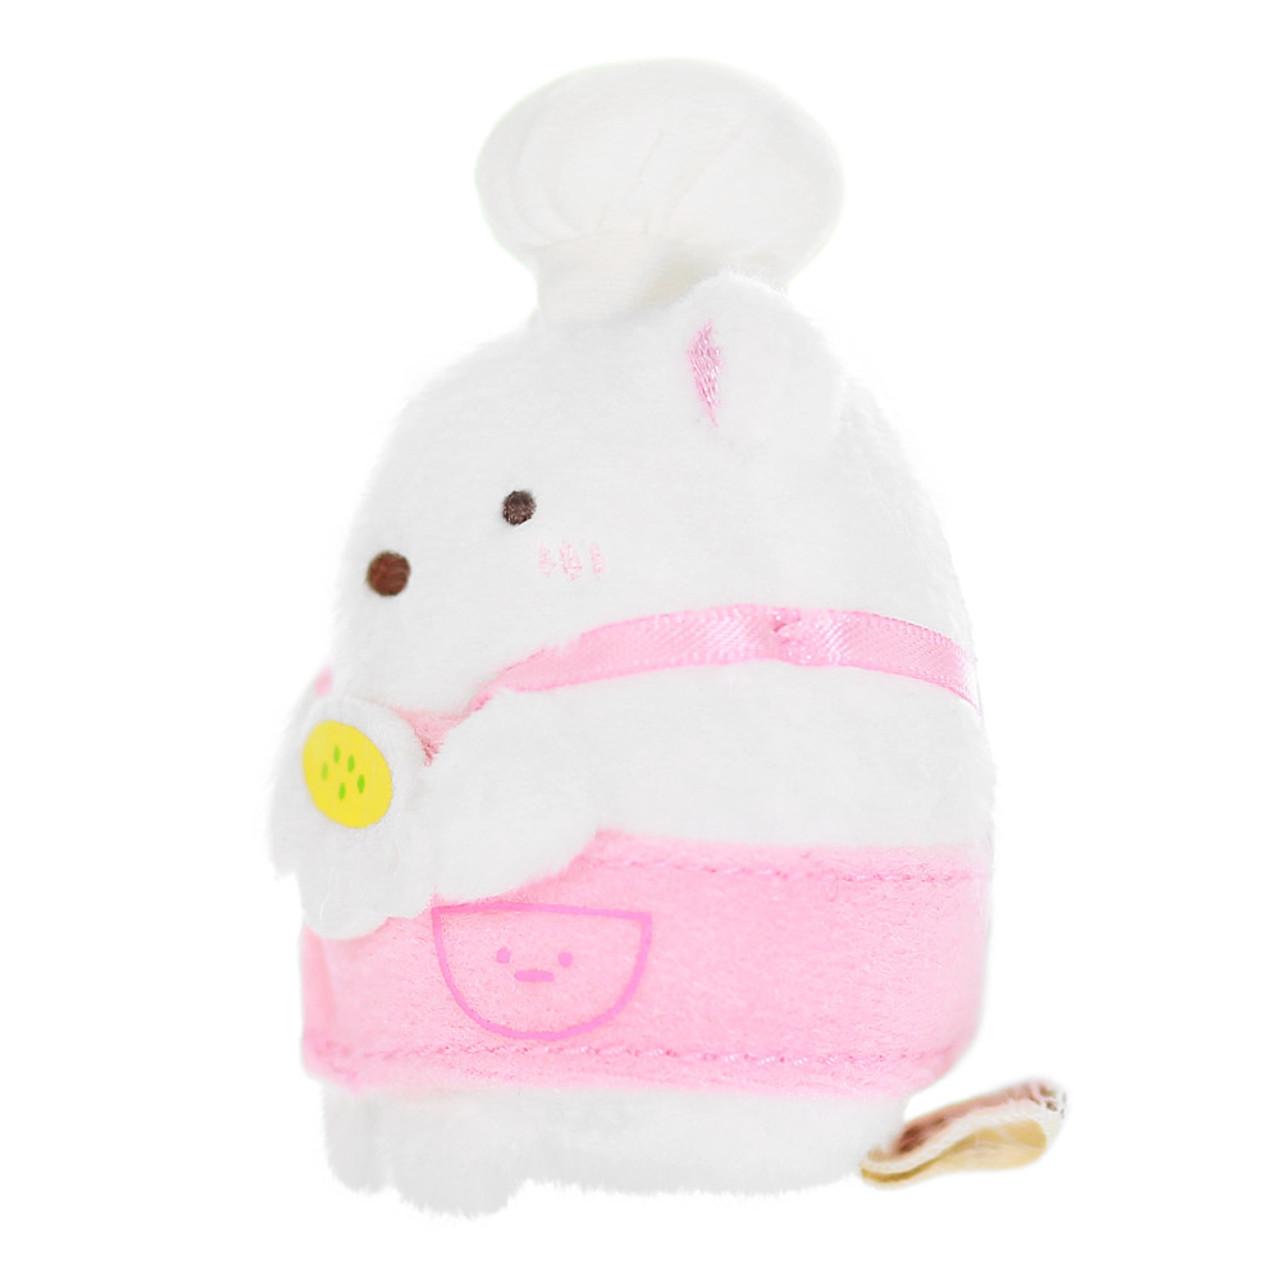 Sumikko Gurashi Polar Bear Palm Stuffed Animal - Chef ( Side View )